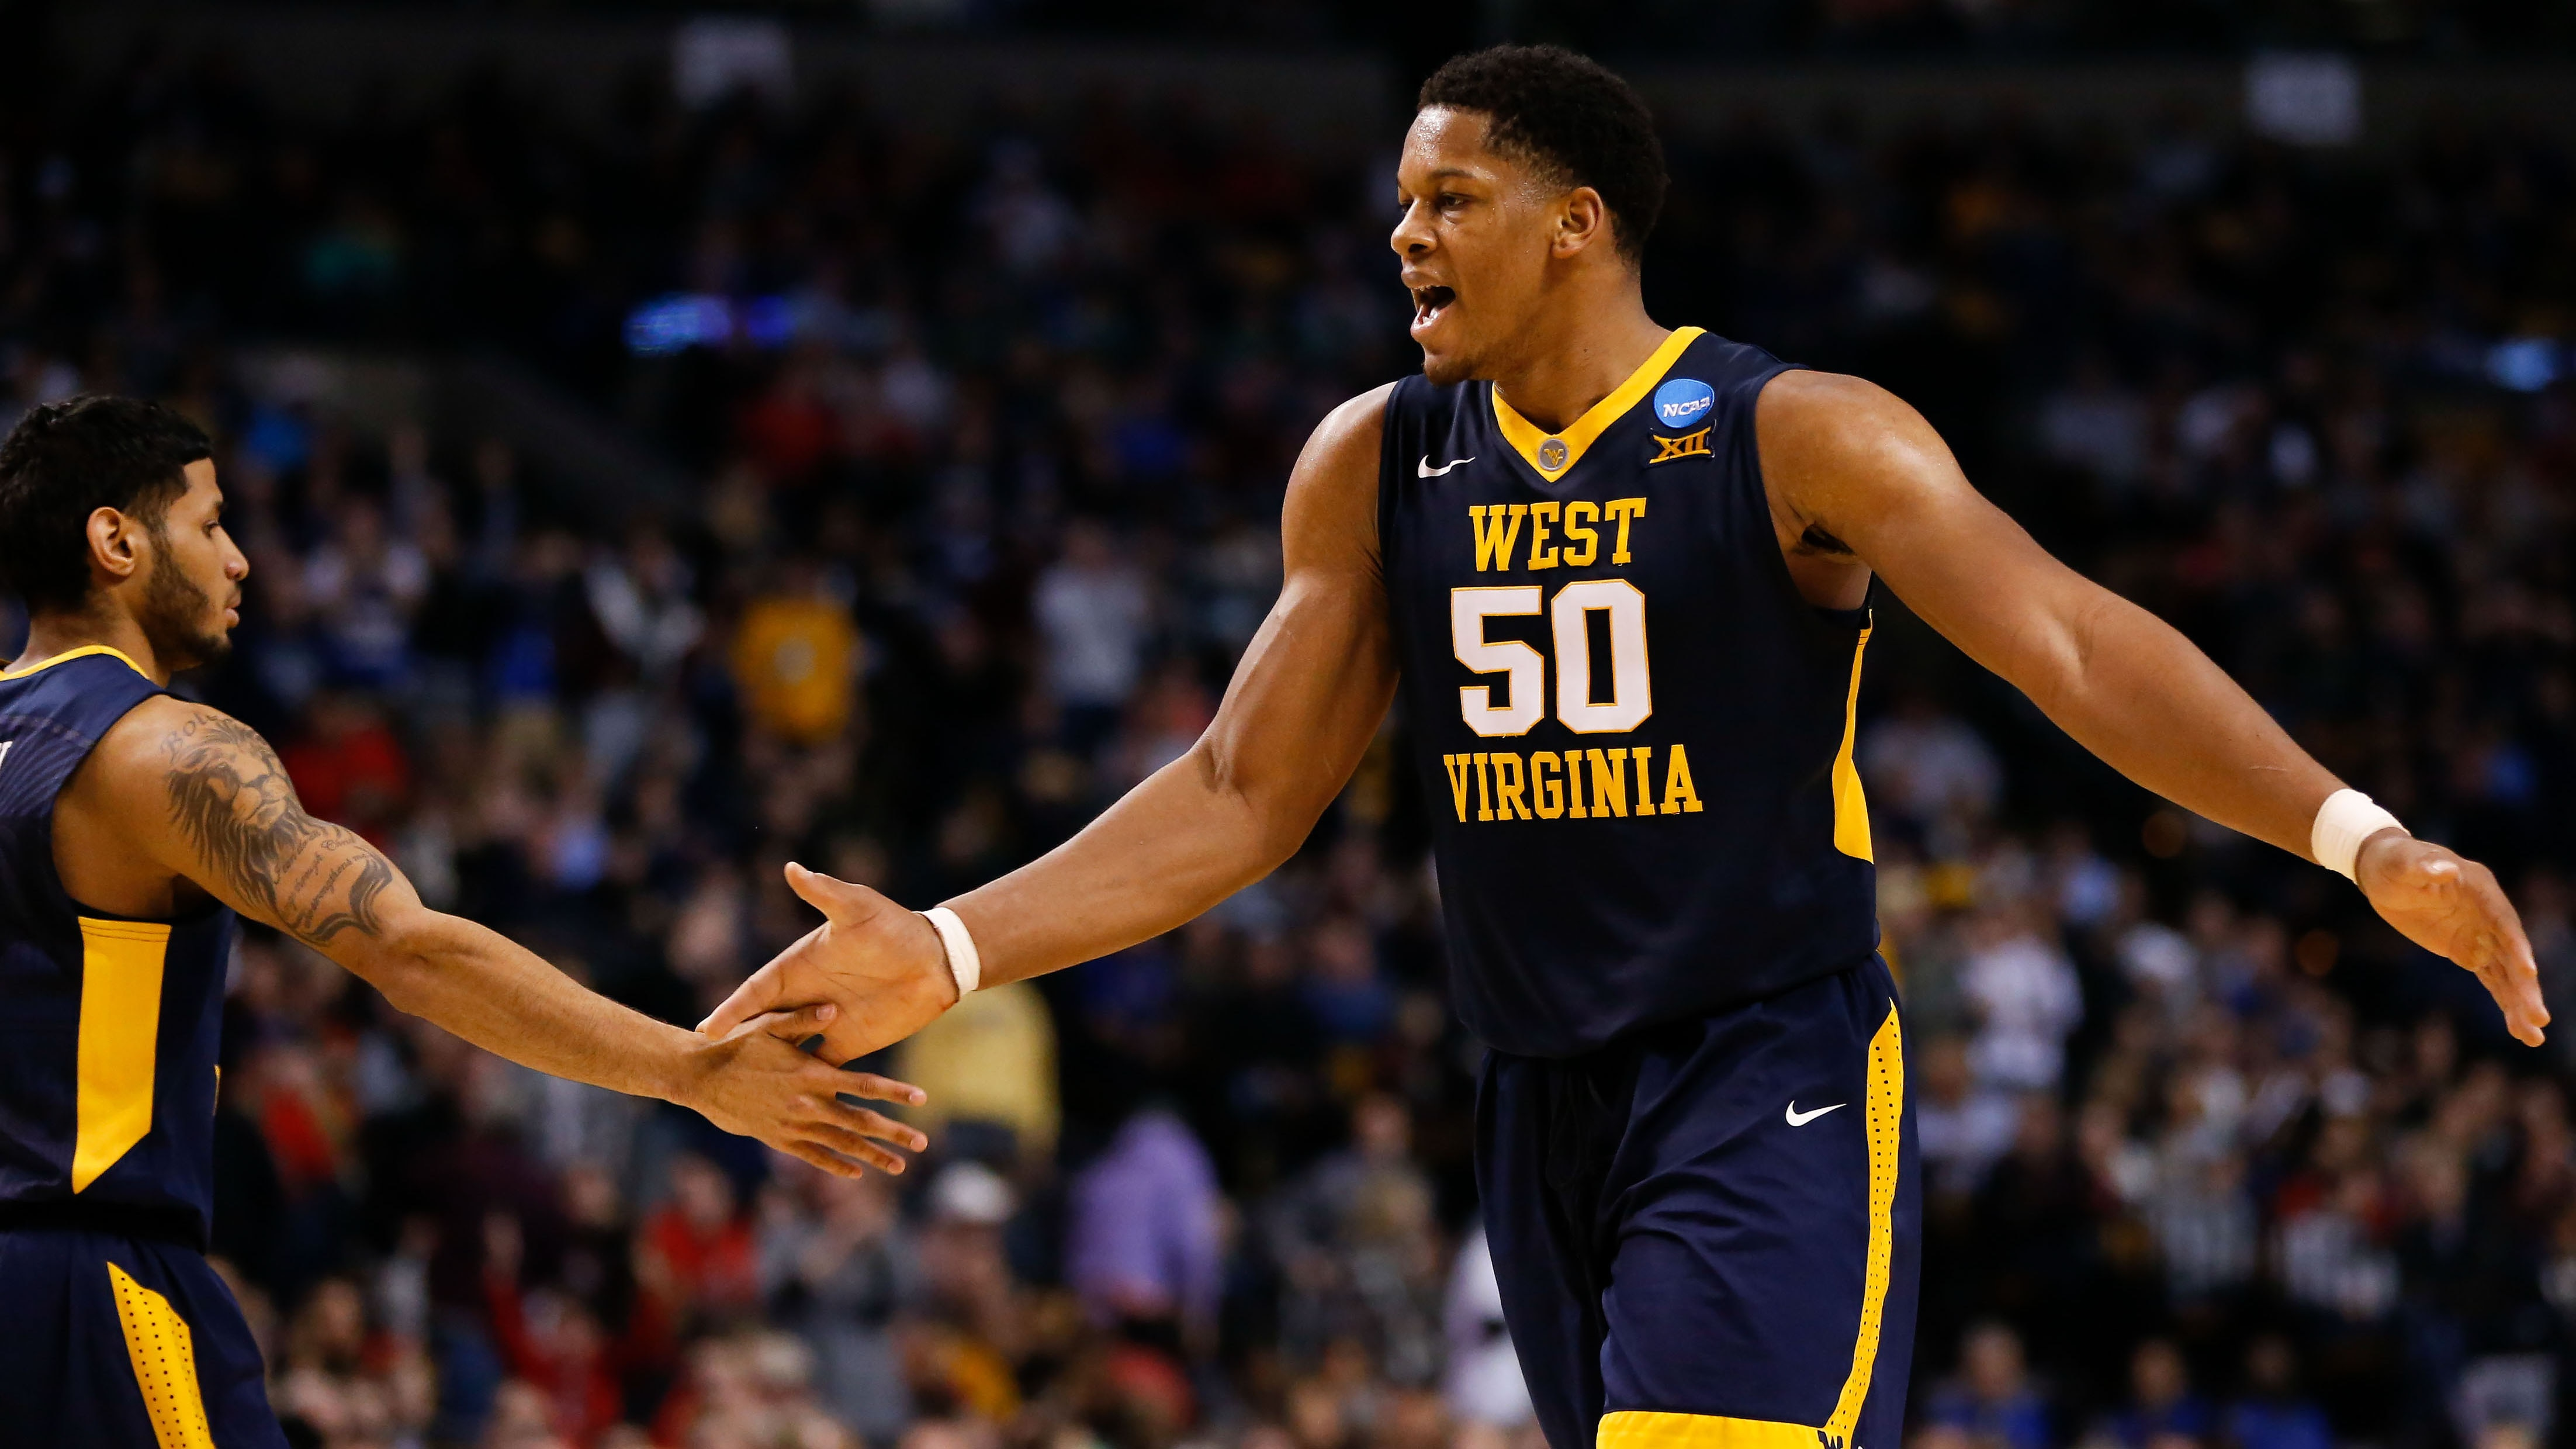 West Virginia's Sagaba Konate high fives a teammate